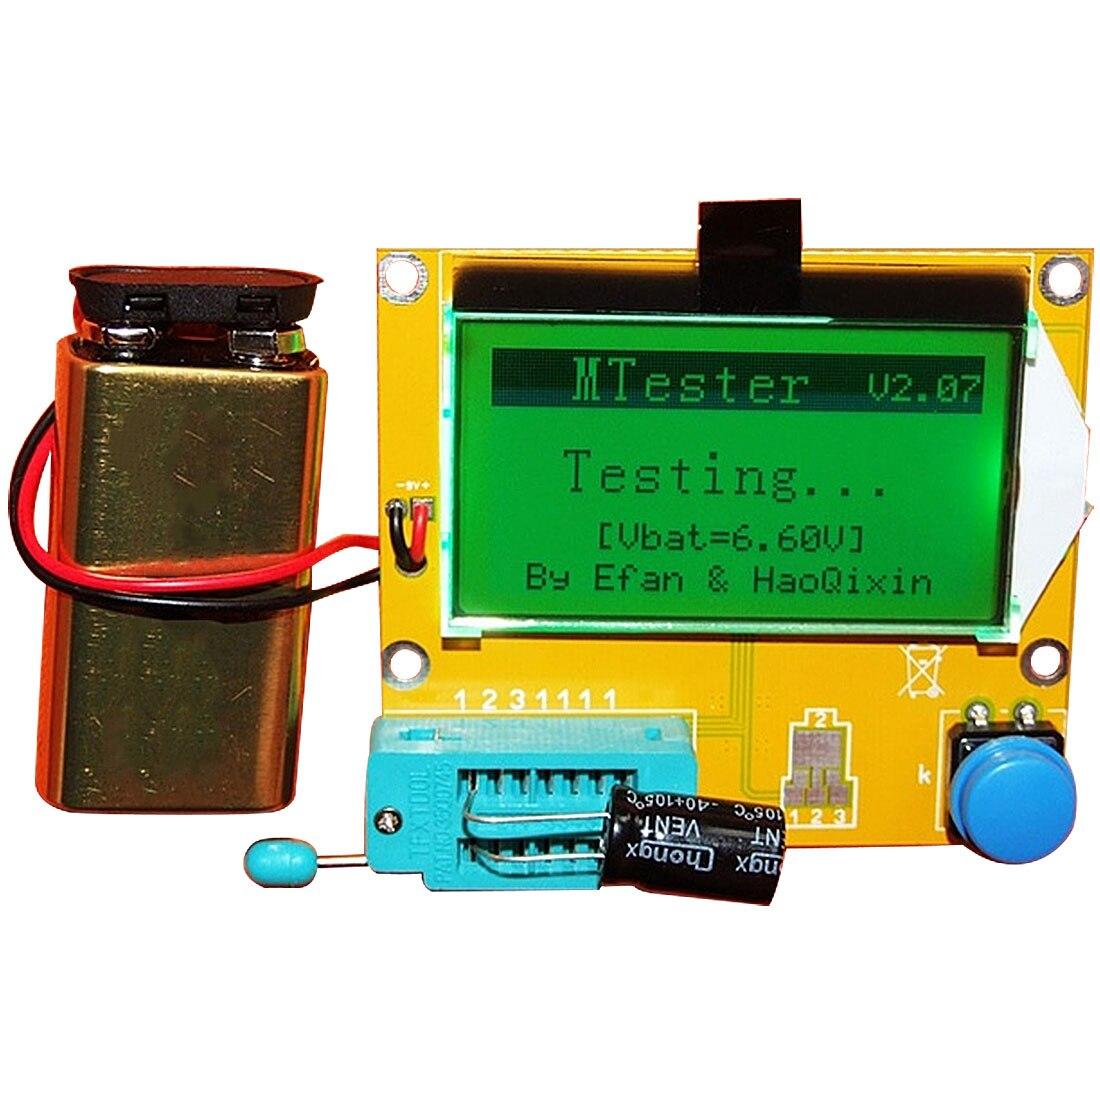 LCR-T4 M328 Digitale Transistor Tester Diode Triode Kapazität ESR Meter MOS/PNP/NPN LCR 12864 LCD Bildschirm